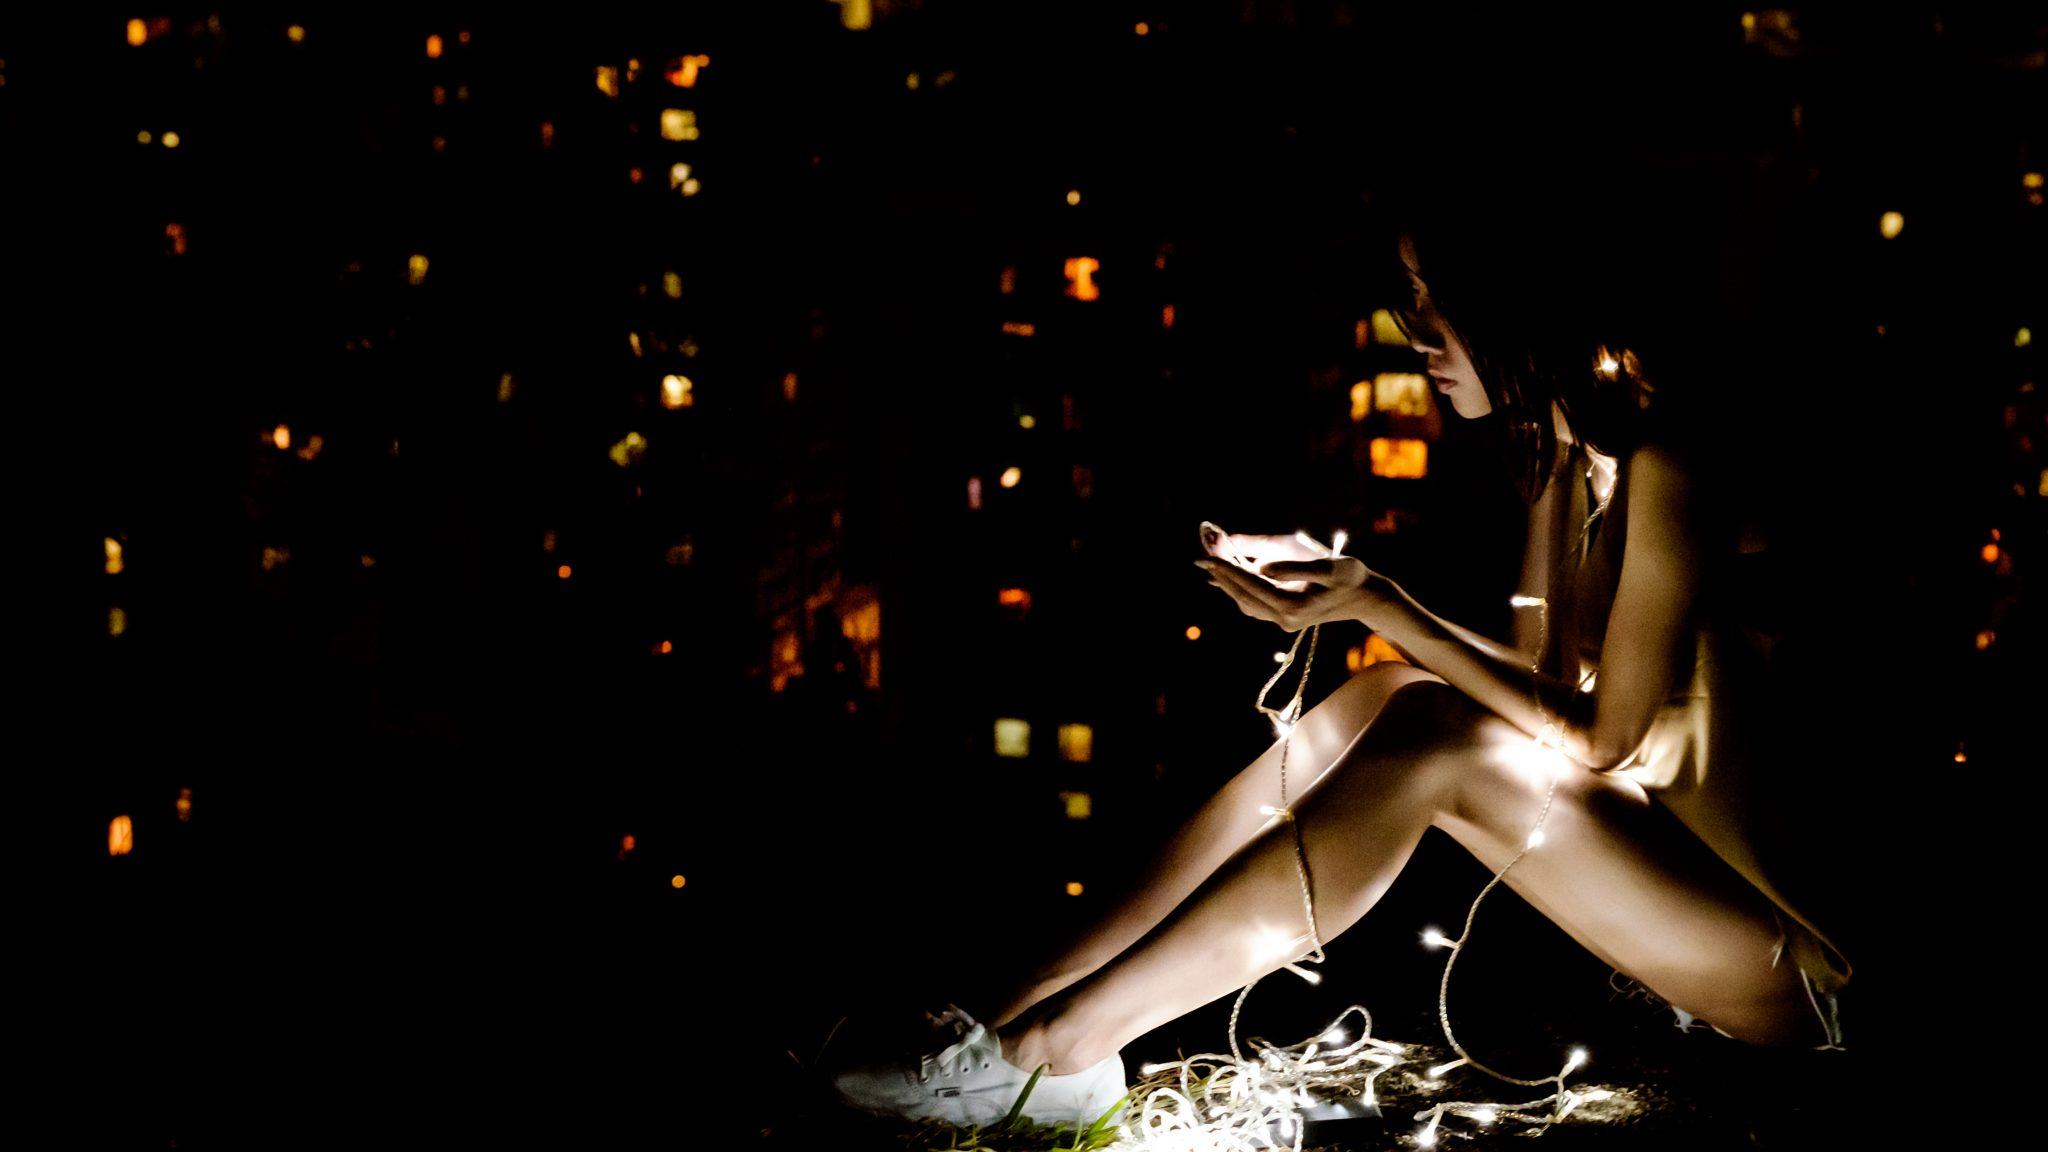 Donna che utilizza una App mindfulness sul suo smartphone - tatianaberlaffa.com